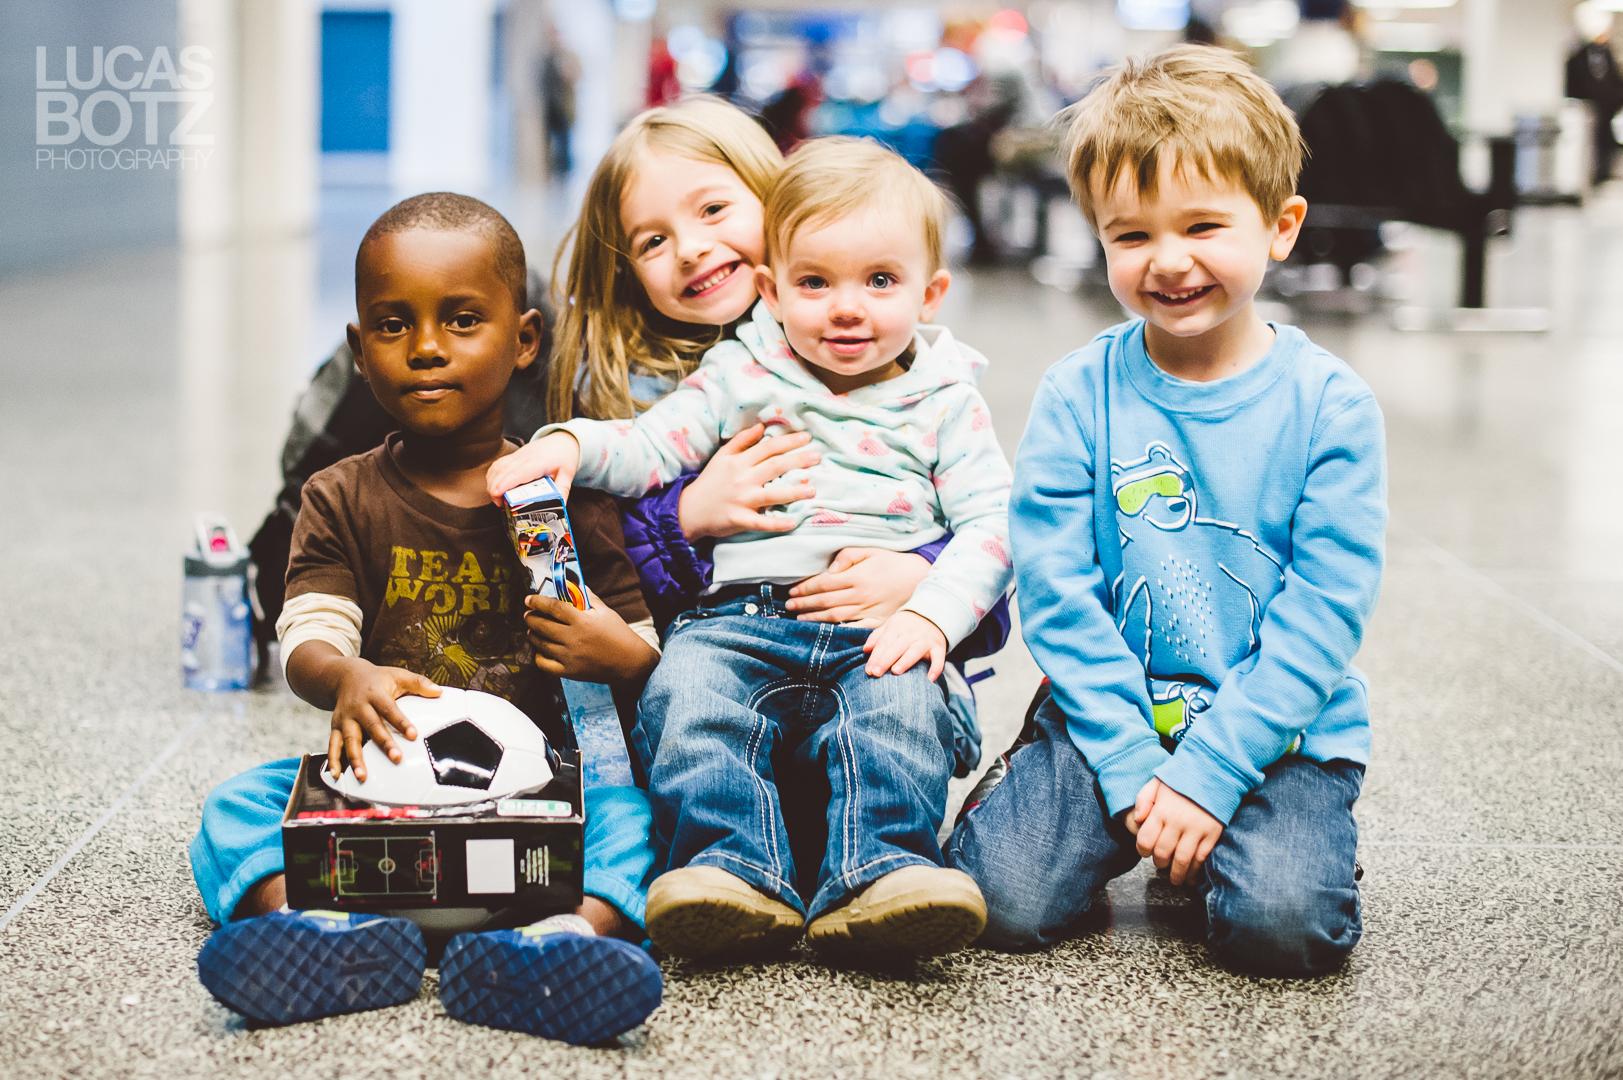 4 Botz kids